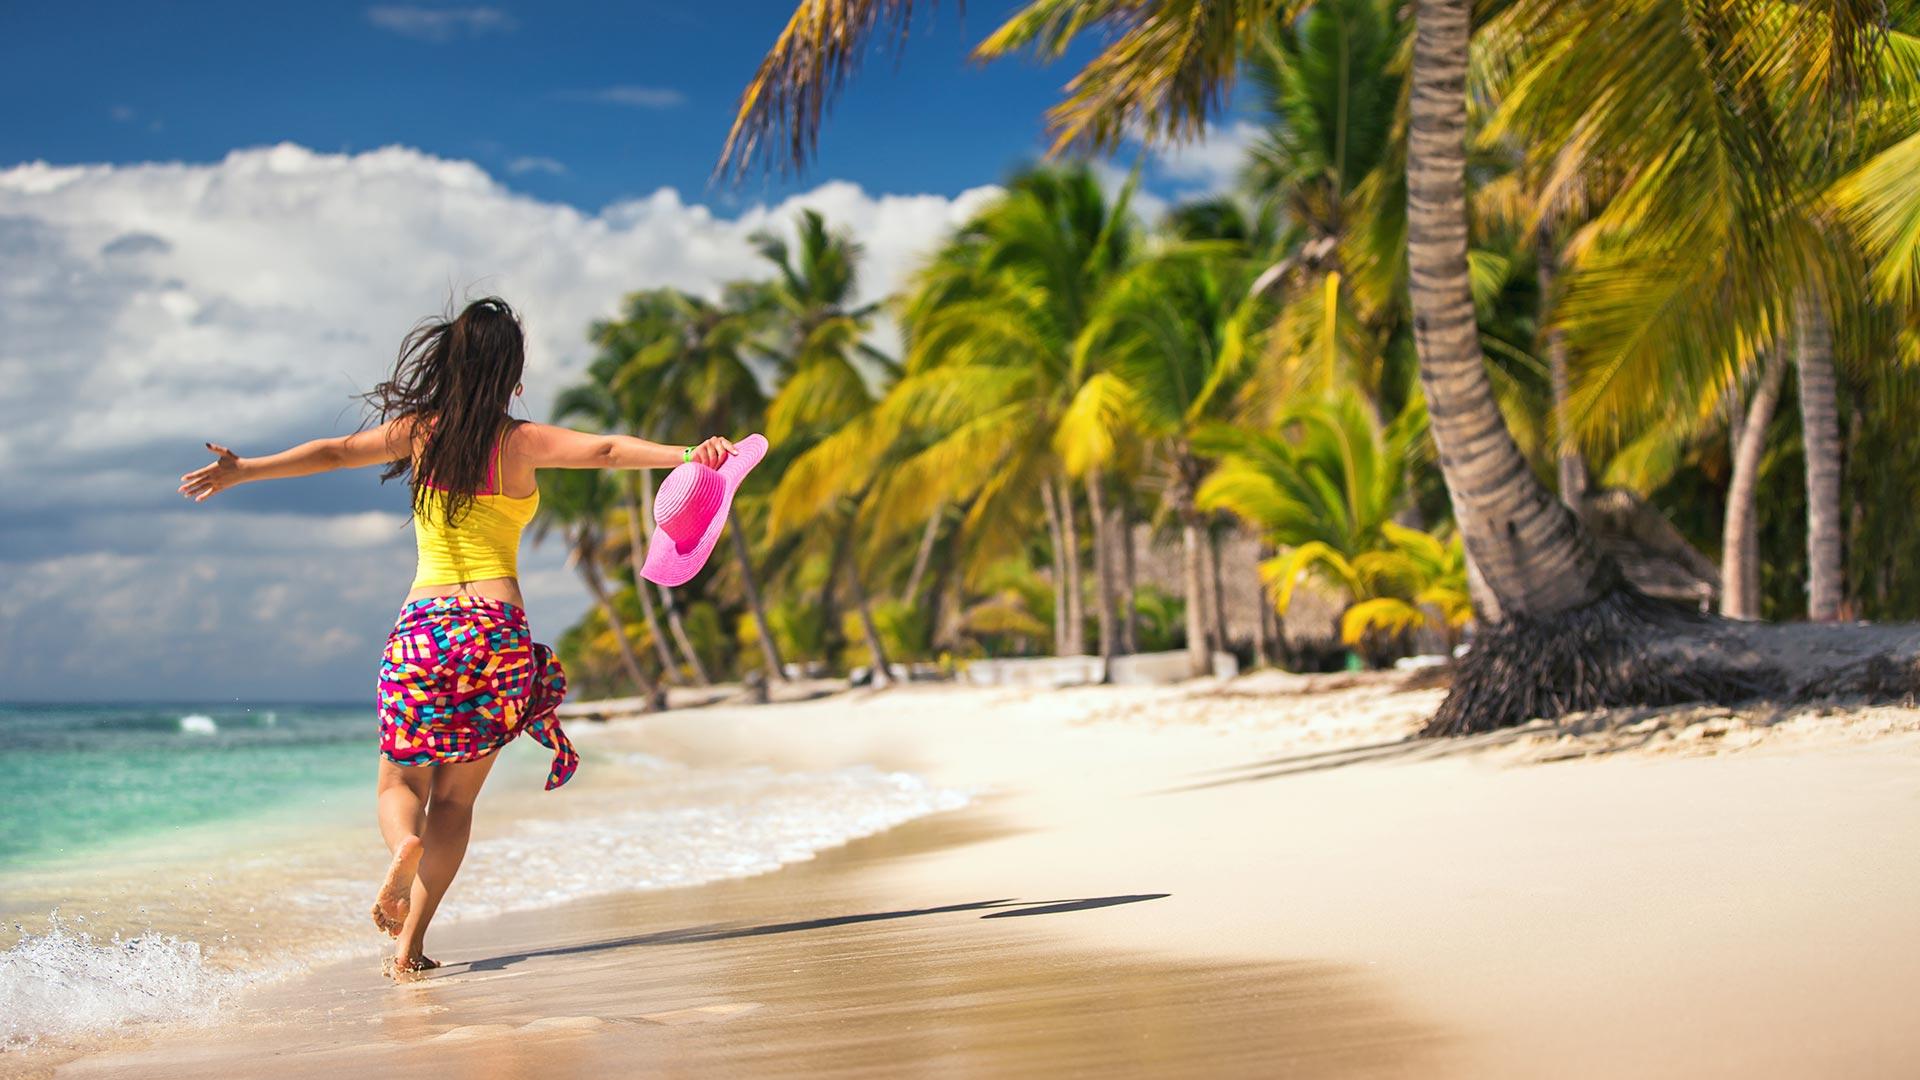 Sejur plaja Punta Cana, Republica Dominicana, 9 zile - Zbor Lufthansa